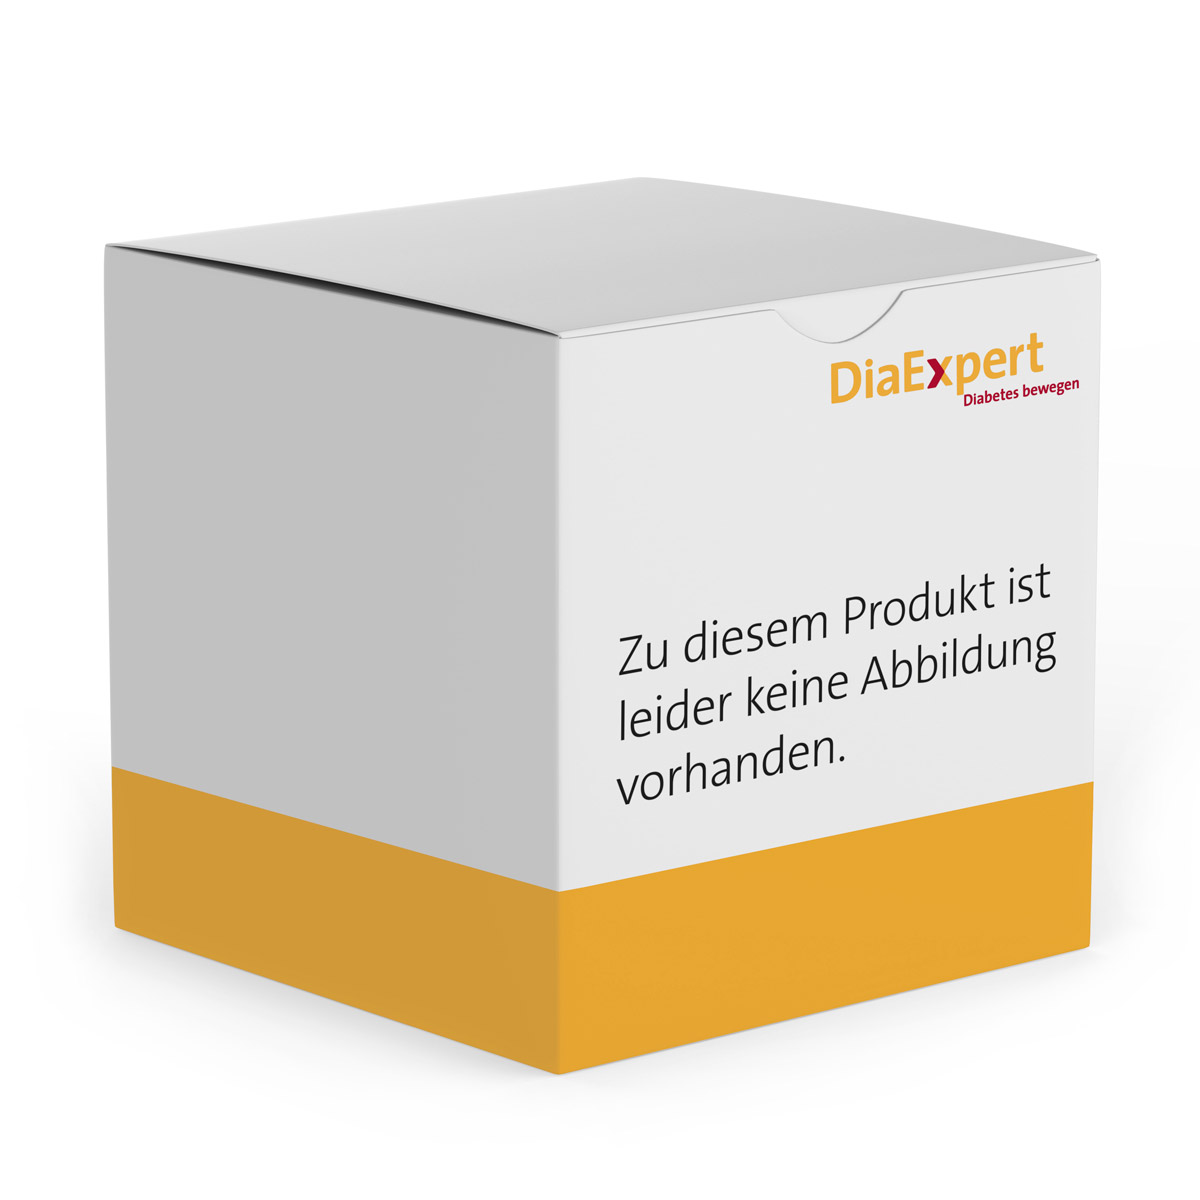 http://www.diaexpert.de/media/catalog/product/cache/1/image/9df78eab33525d08d6e5fb8d27136e95/a/c/accu-chek_aviva.jpg